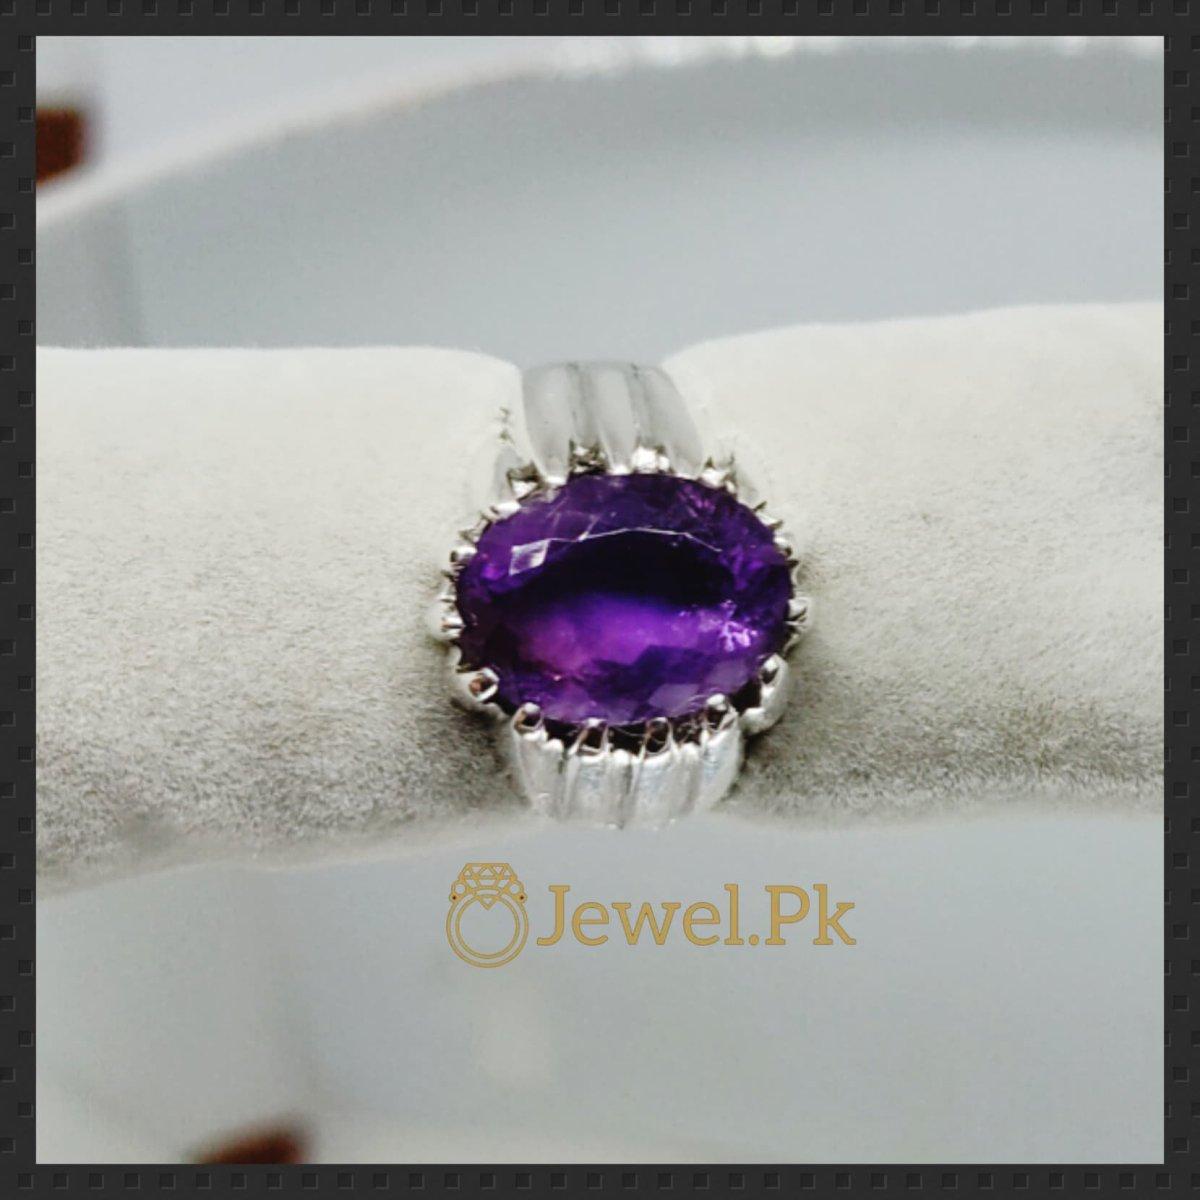 Natural Amethyst Ring in 925 Silver buy online in pakistan